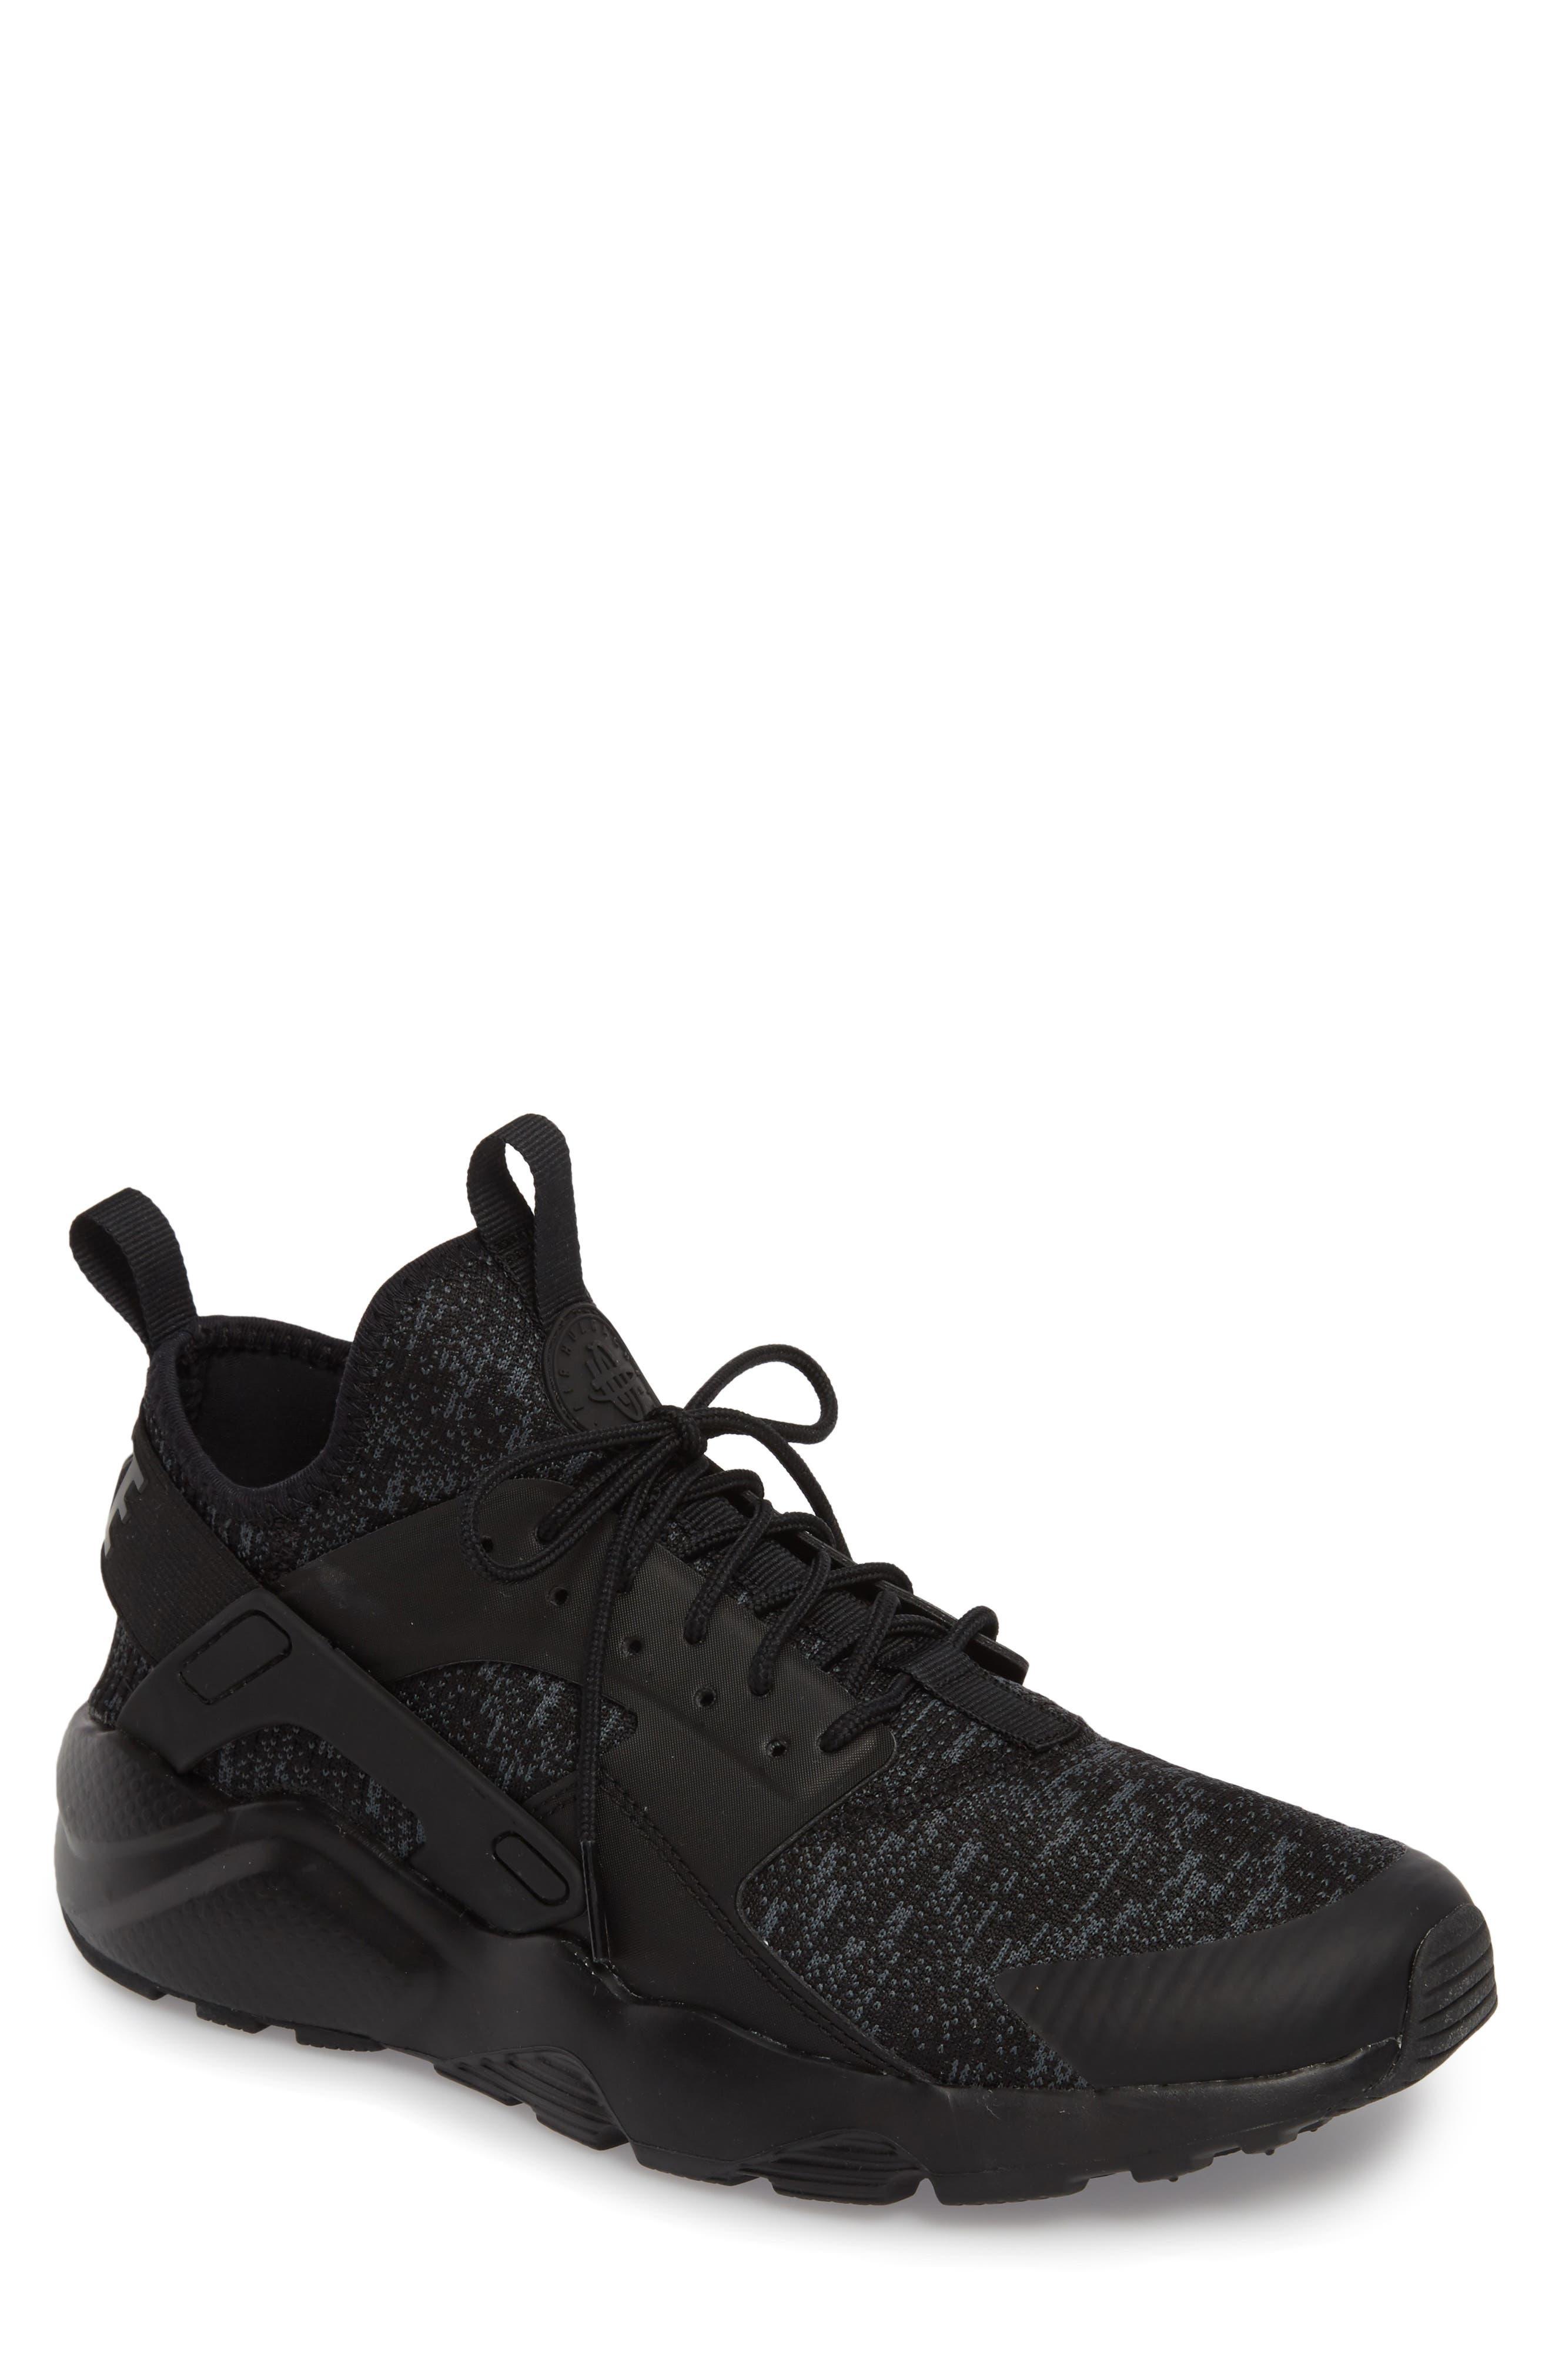 Air Huarache Run Ultra SE Sneaker,                             Main thumbnail 1, color,                             006